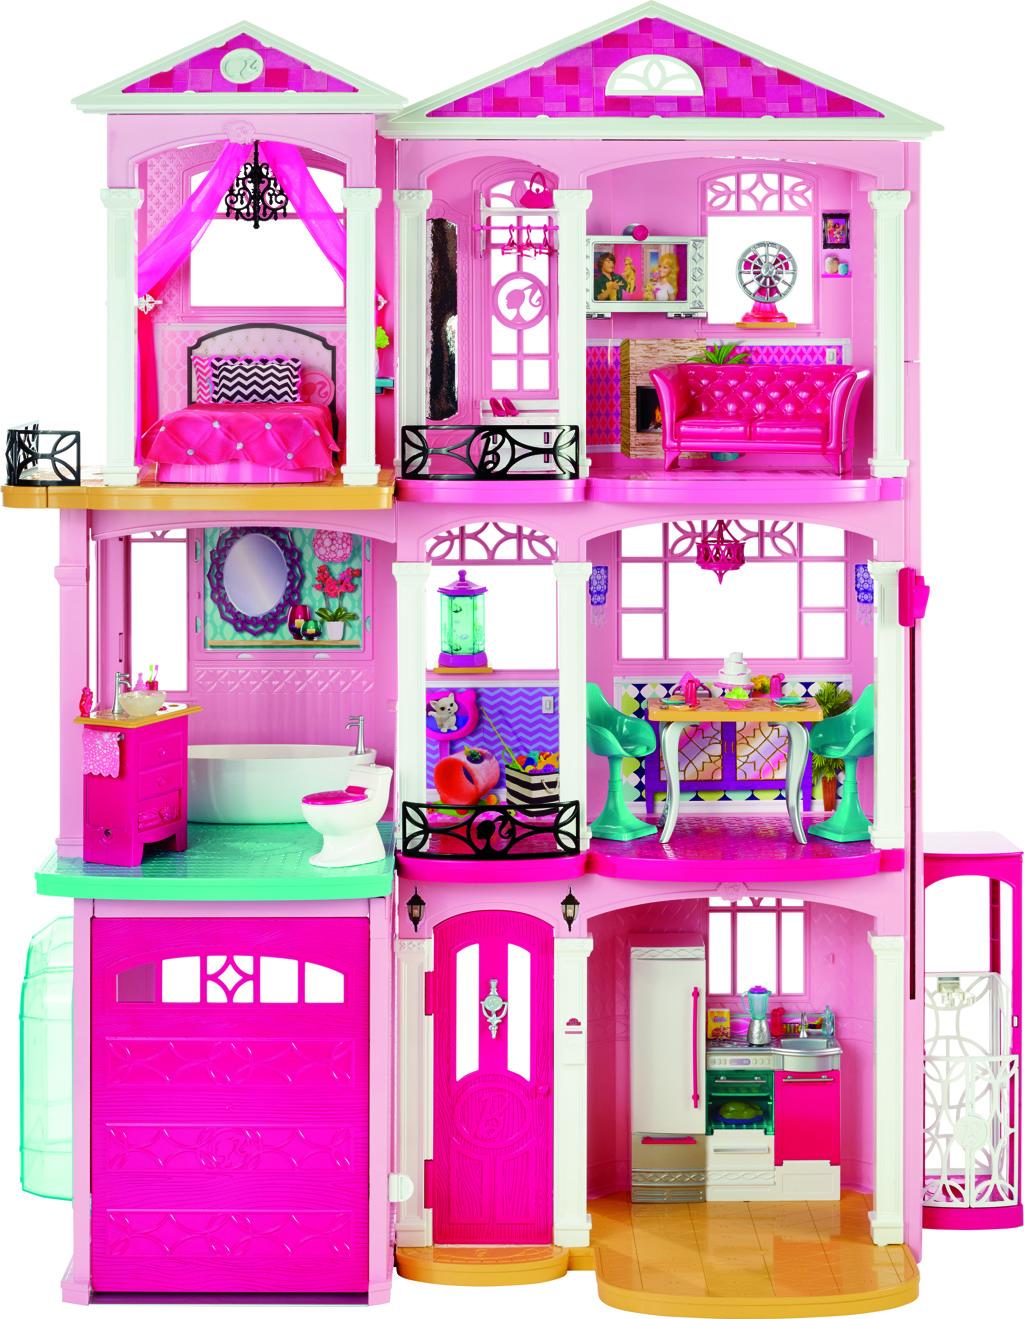 Barbie dream house dům snů